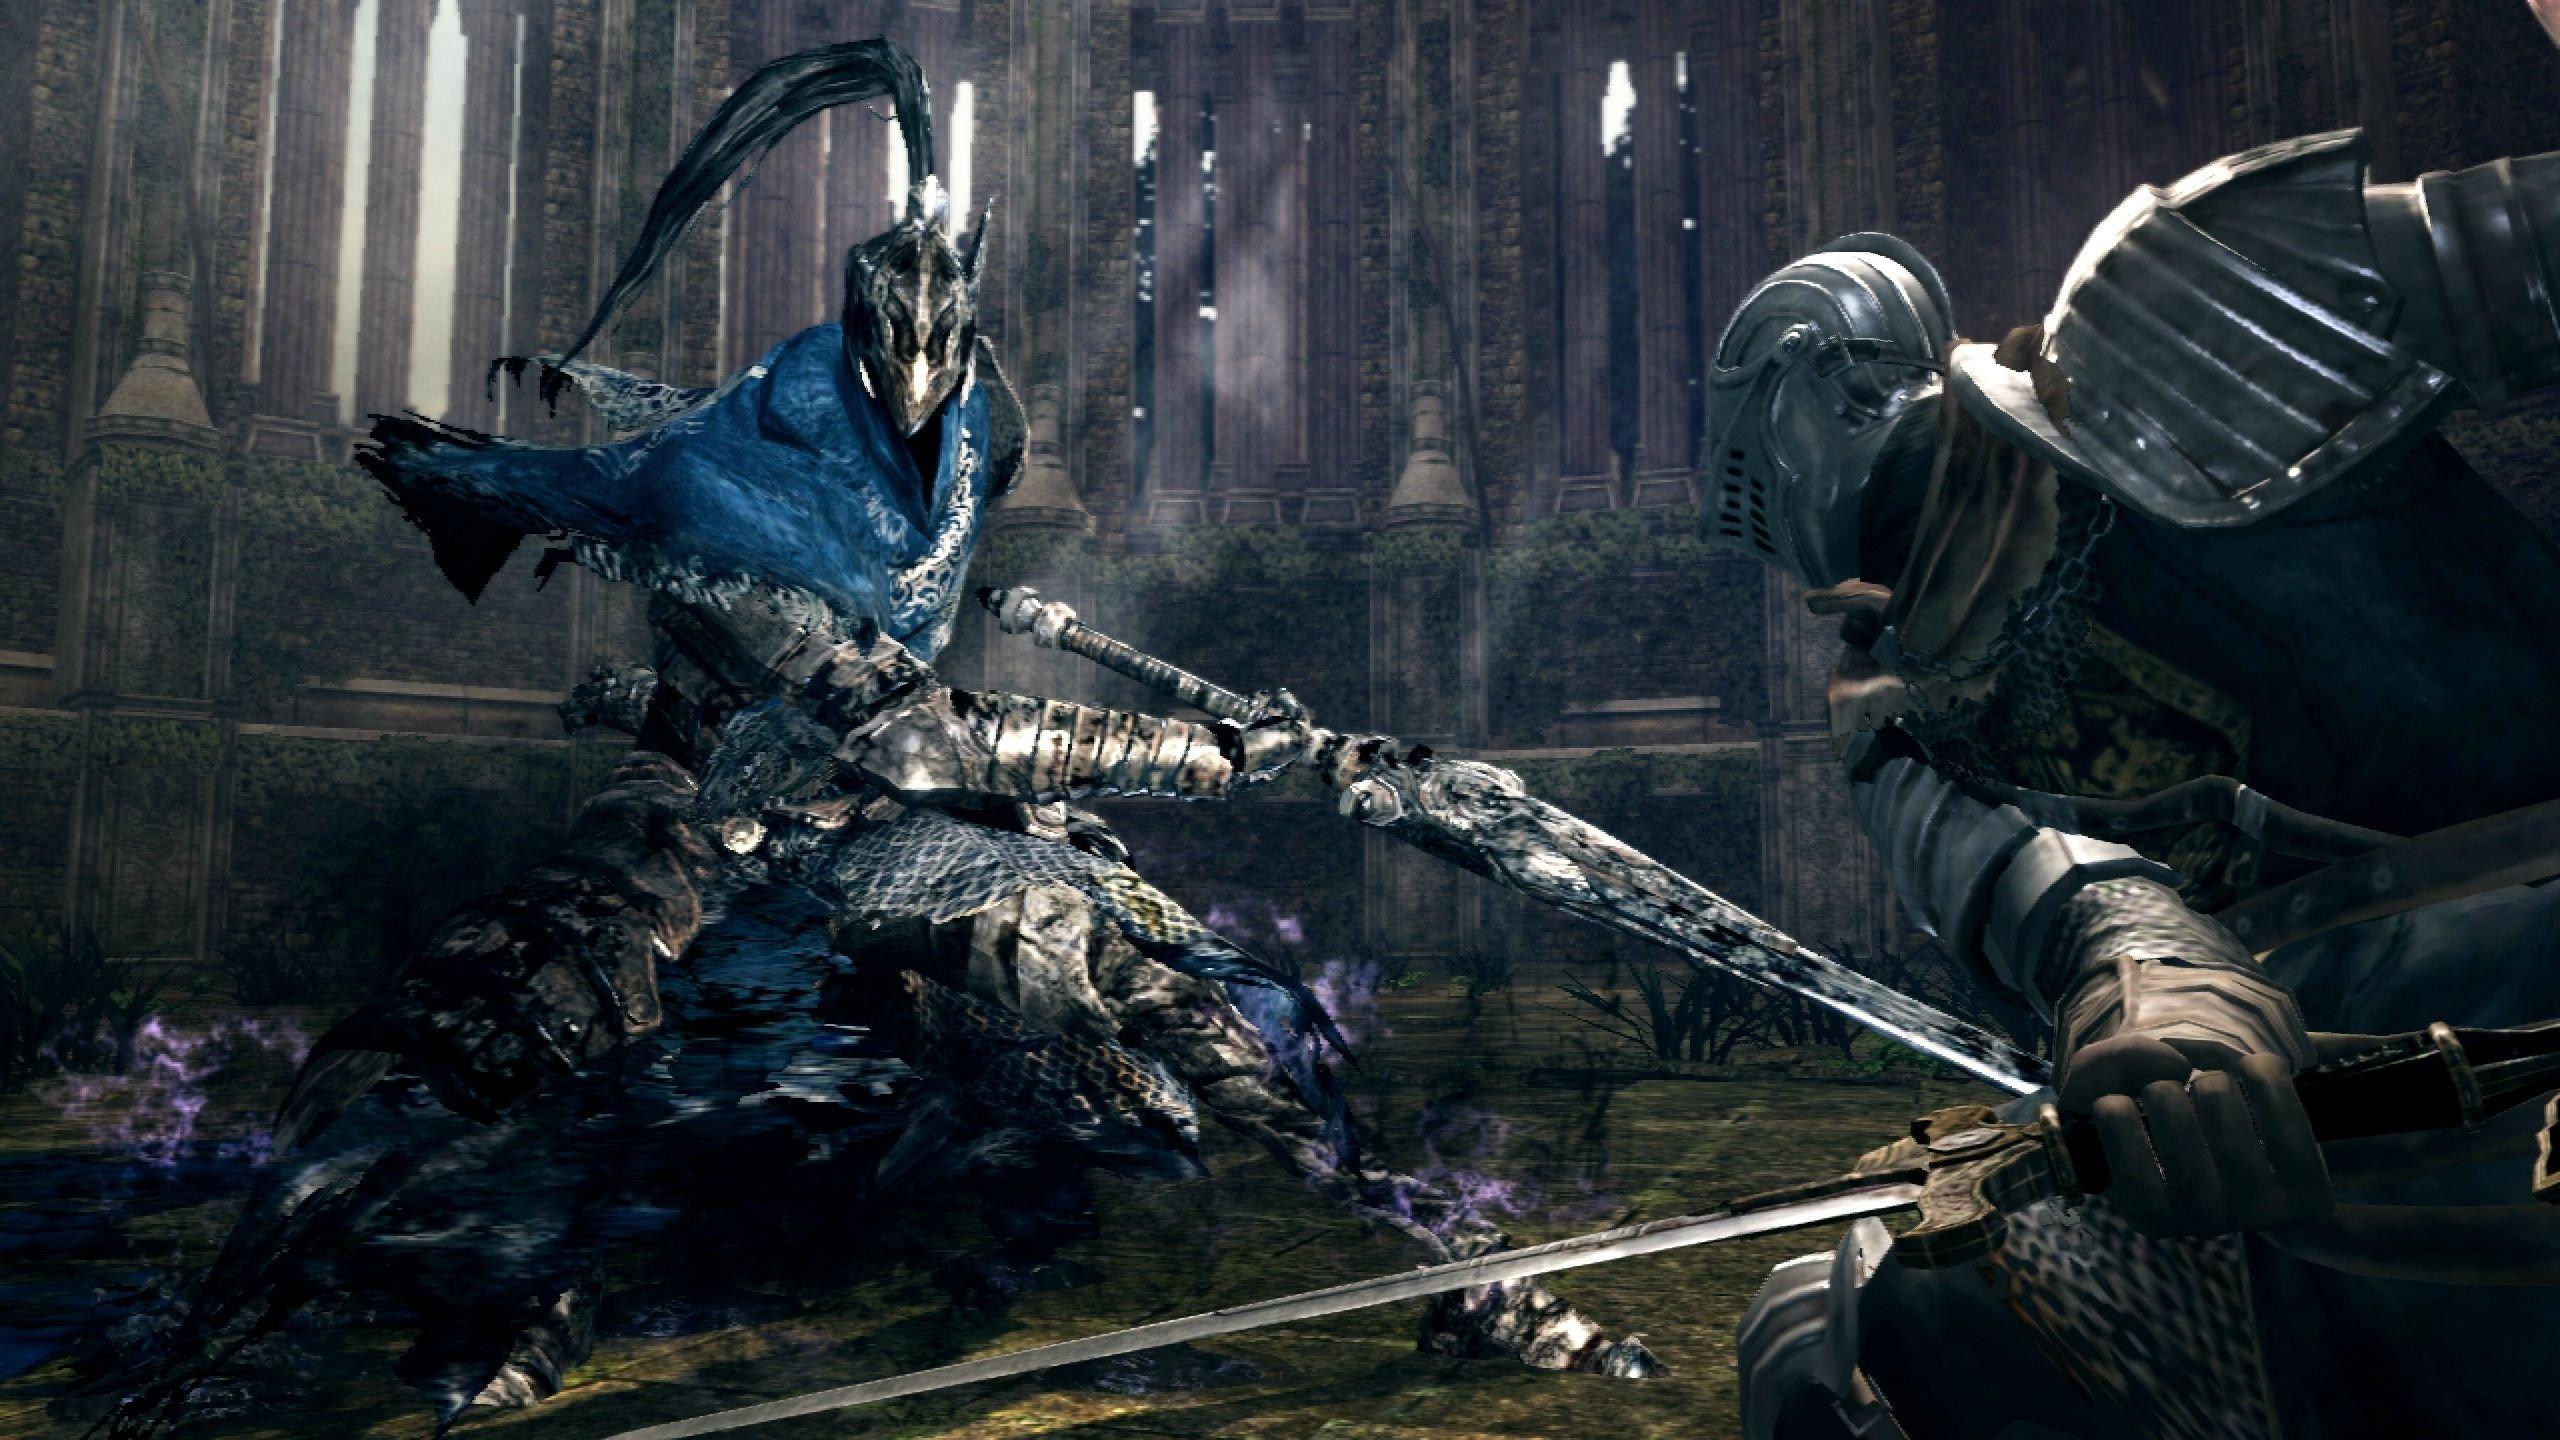 Artorias Dark Souls HD Backgrounds For 2560x1440 Desktop